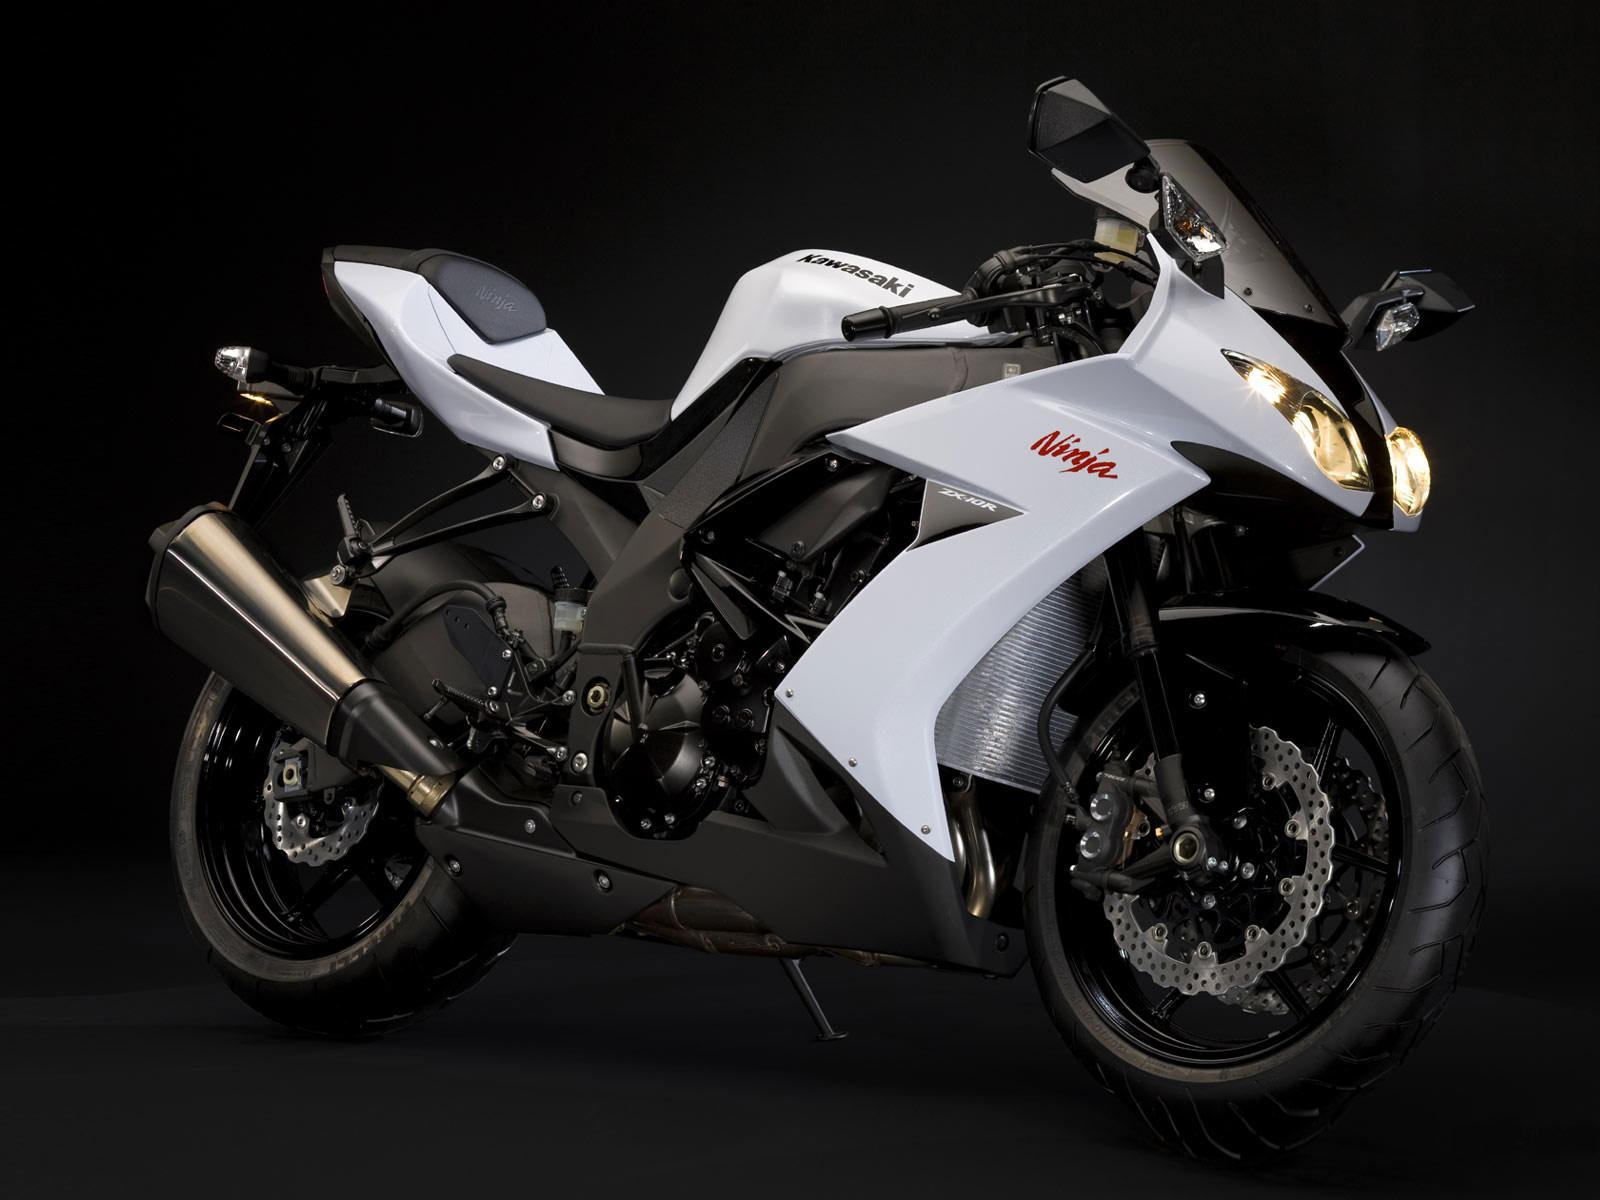 Image Gambar Kawasaki Ninja 250